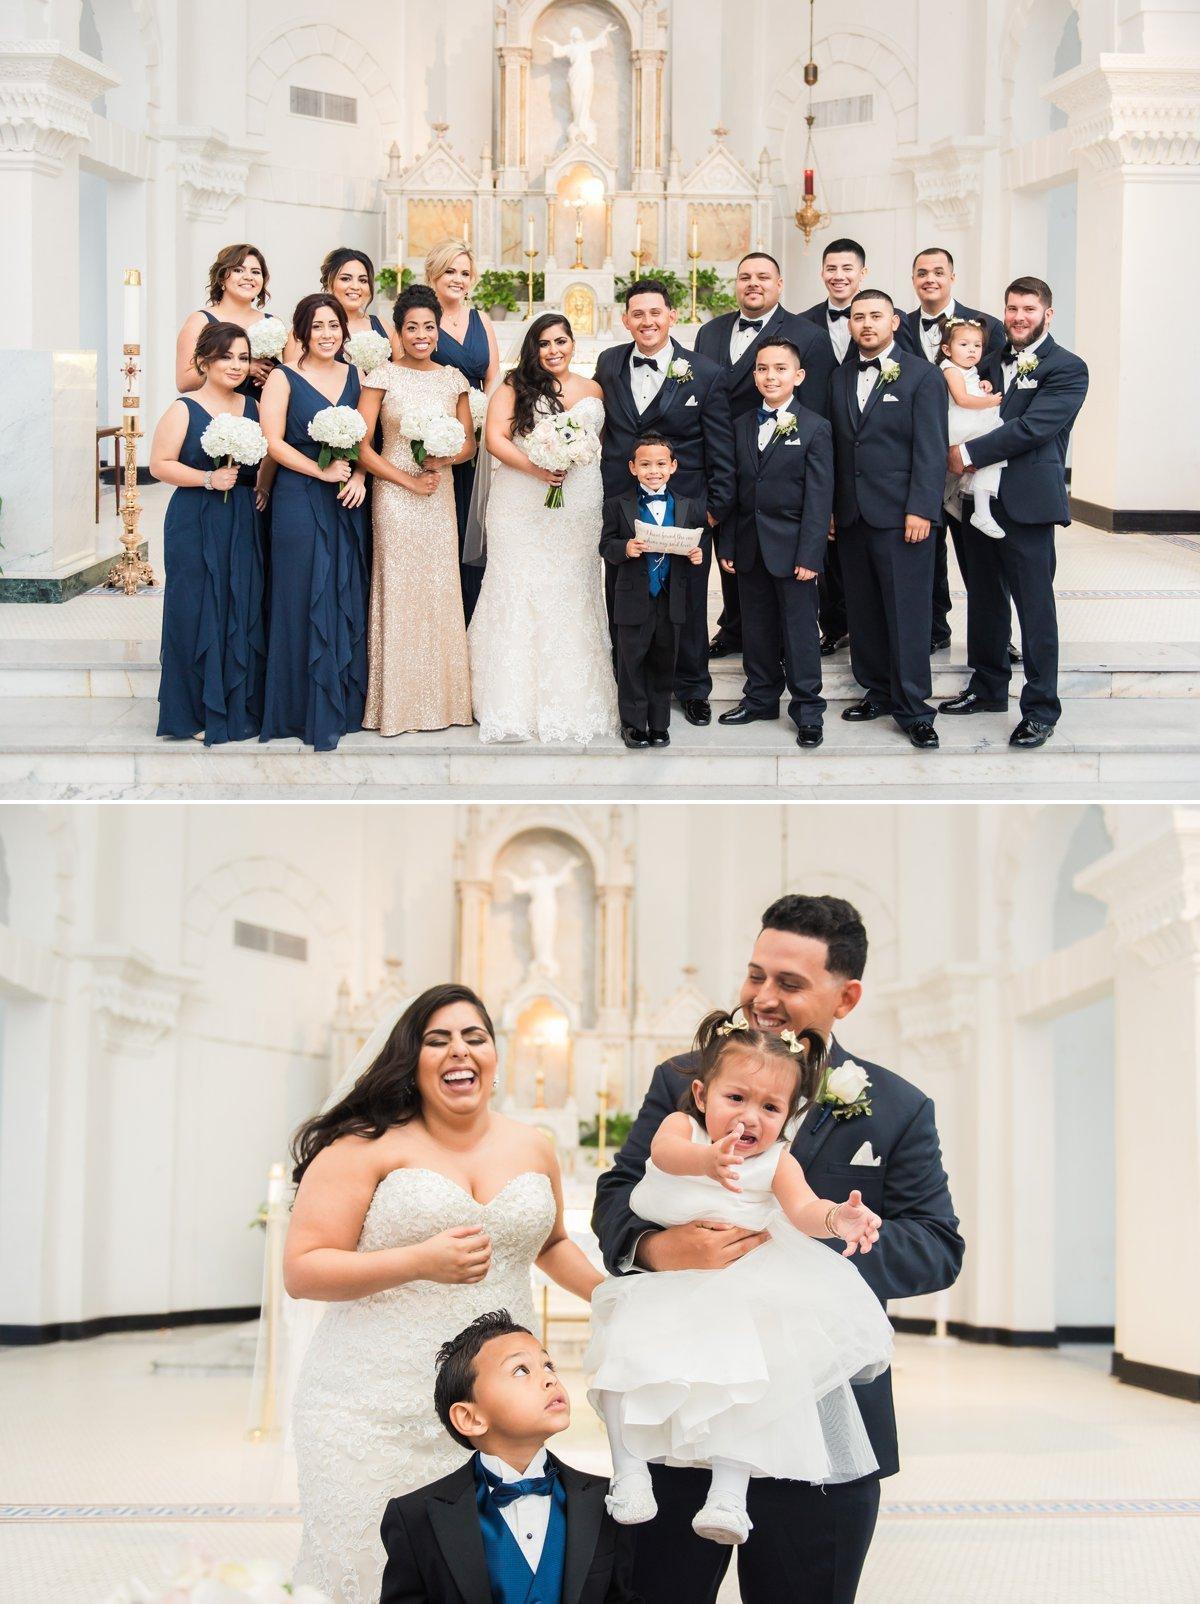 Monica-JJ Wedding 32